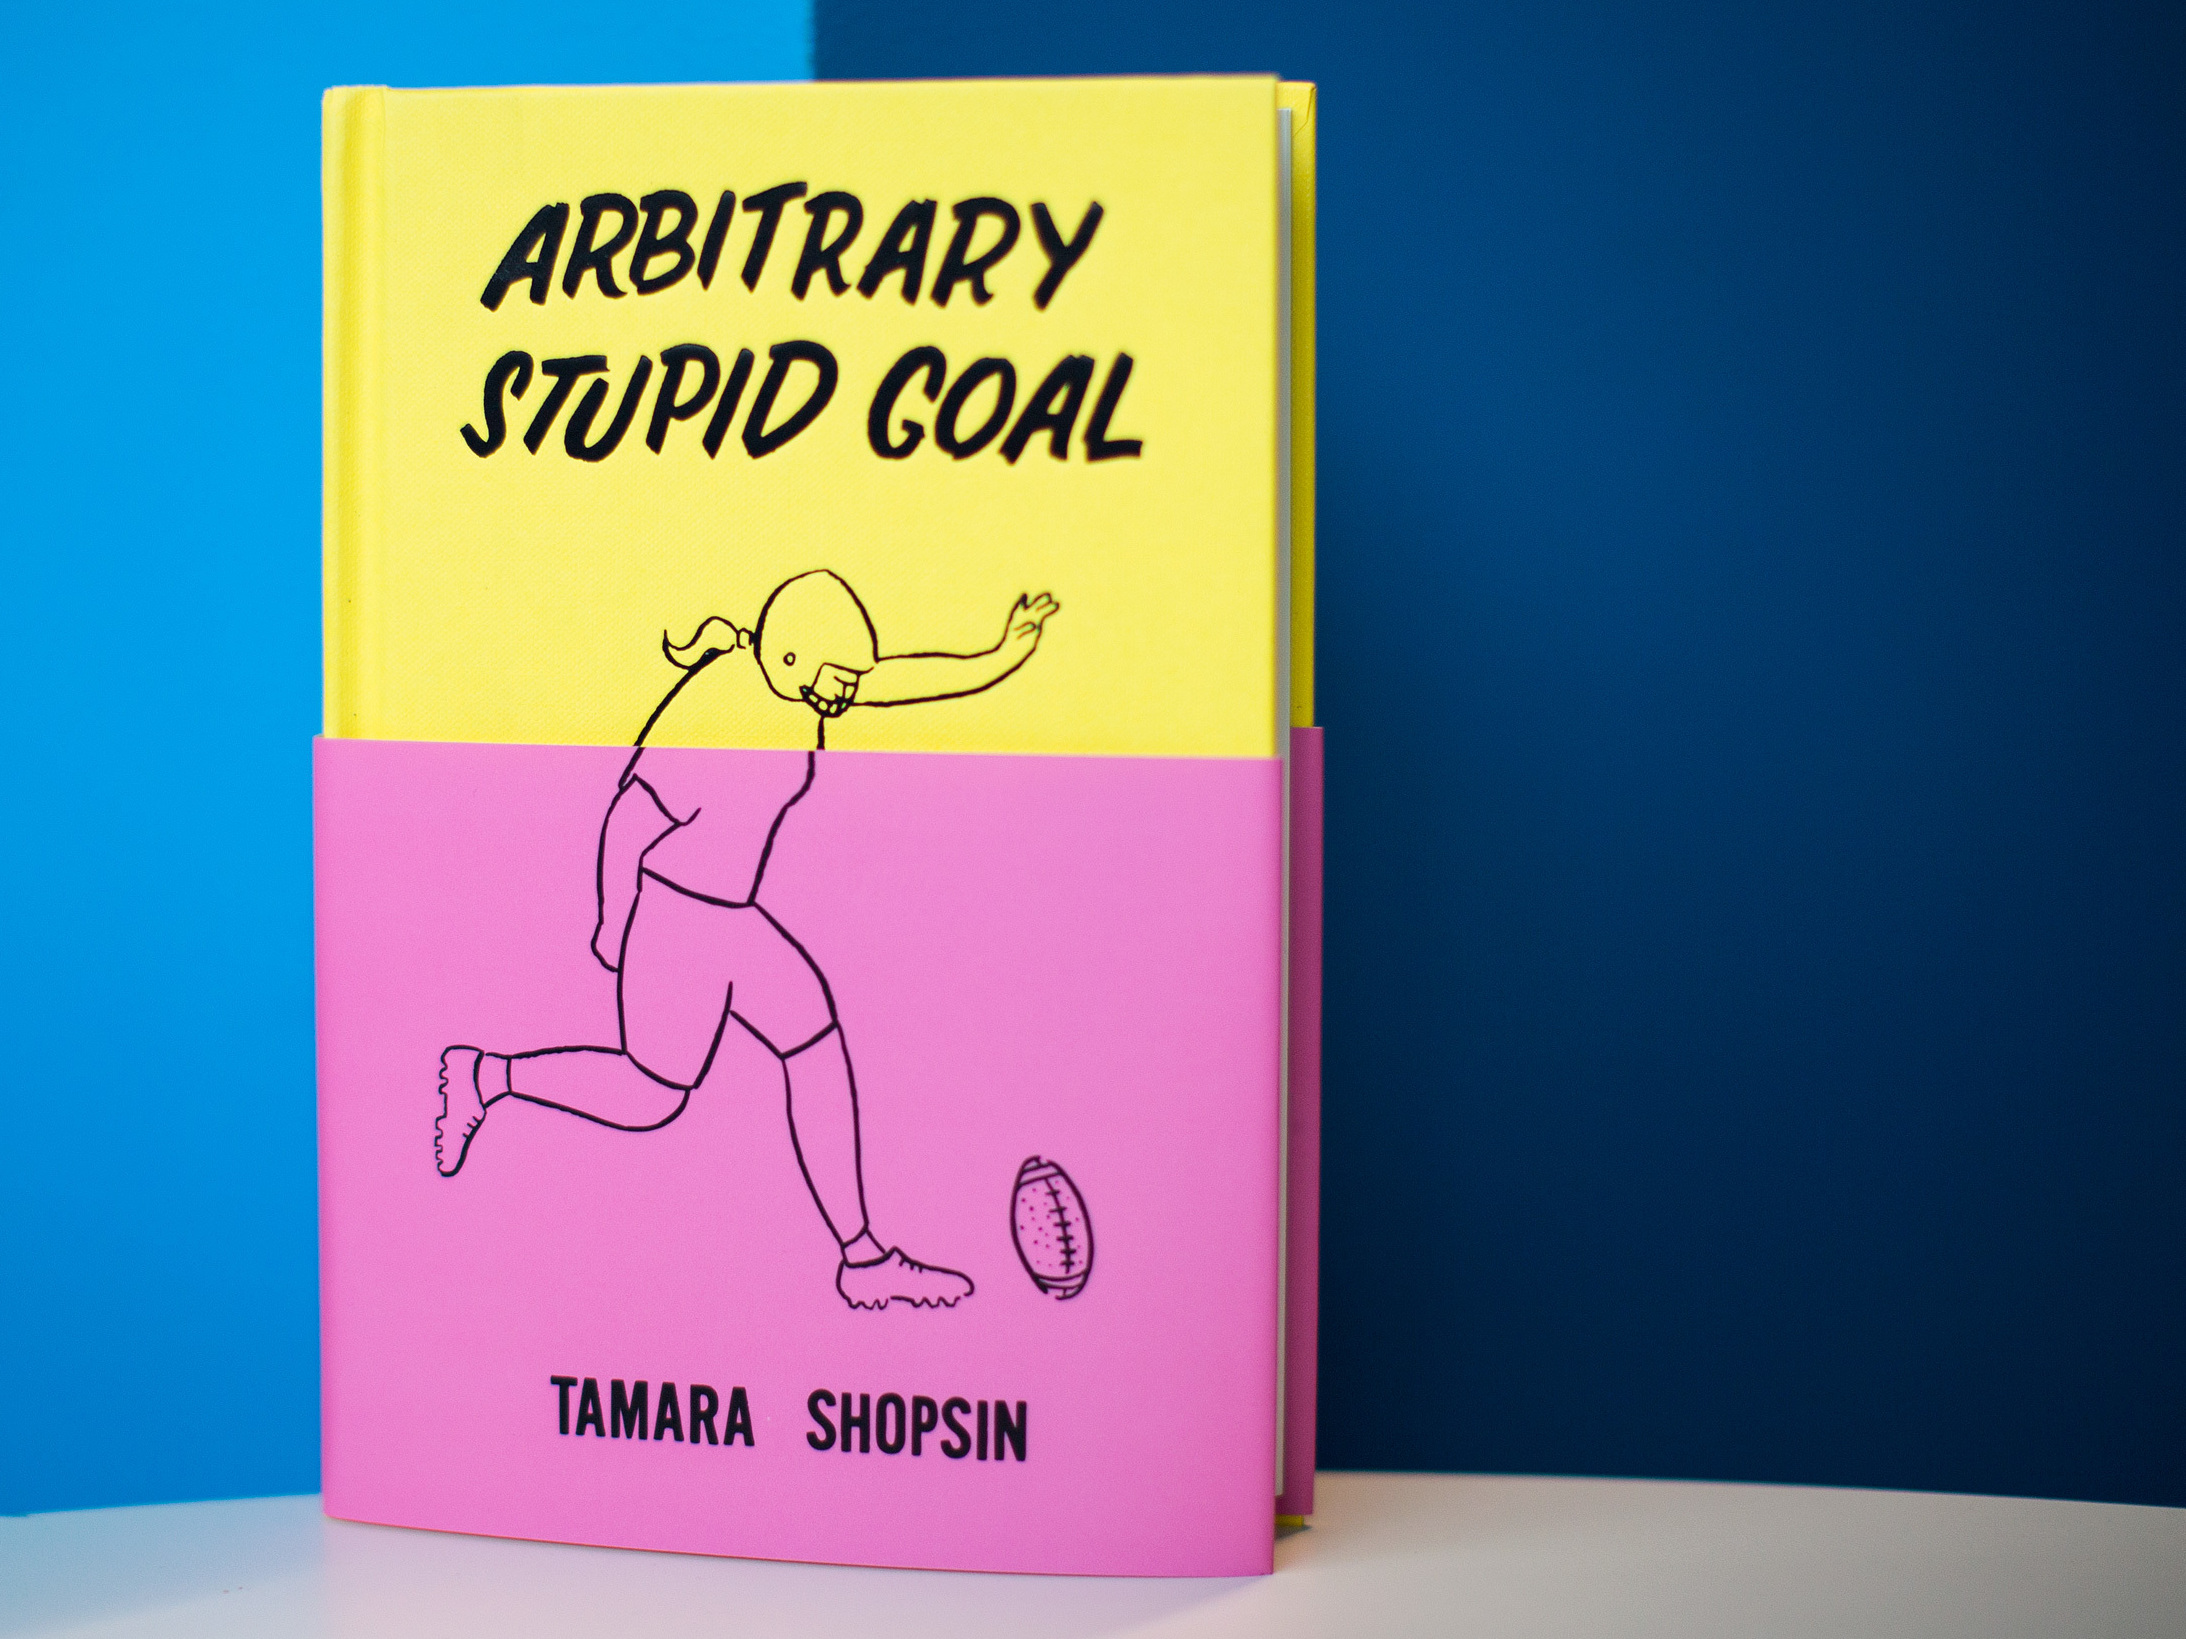 'Arbitrary Stupid Goal' Is Neither Arbitrary Nor Stupid